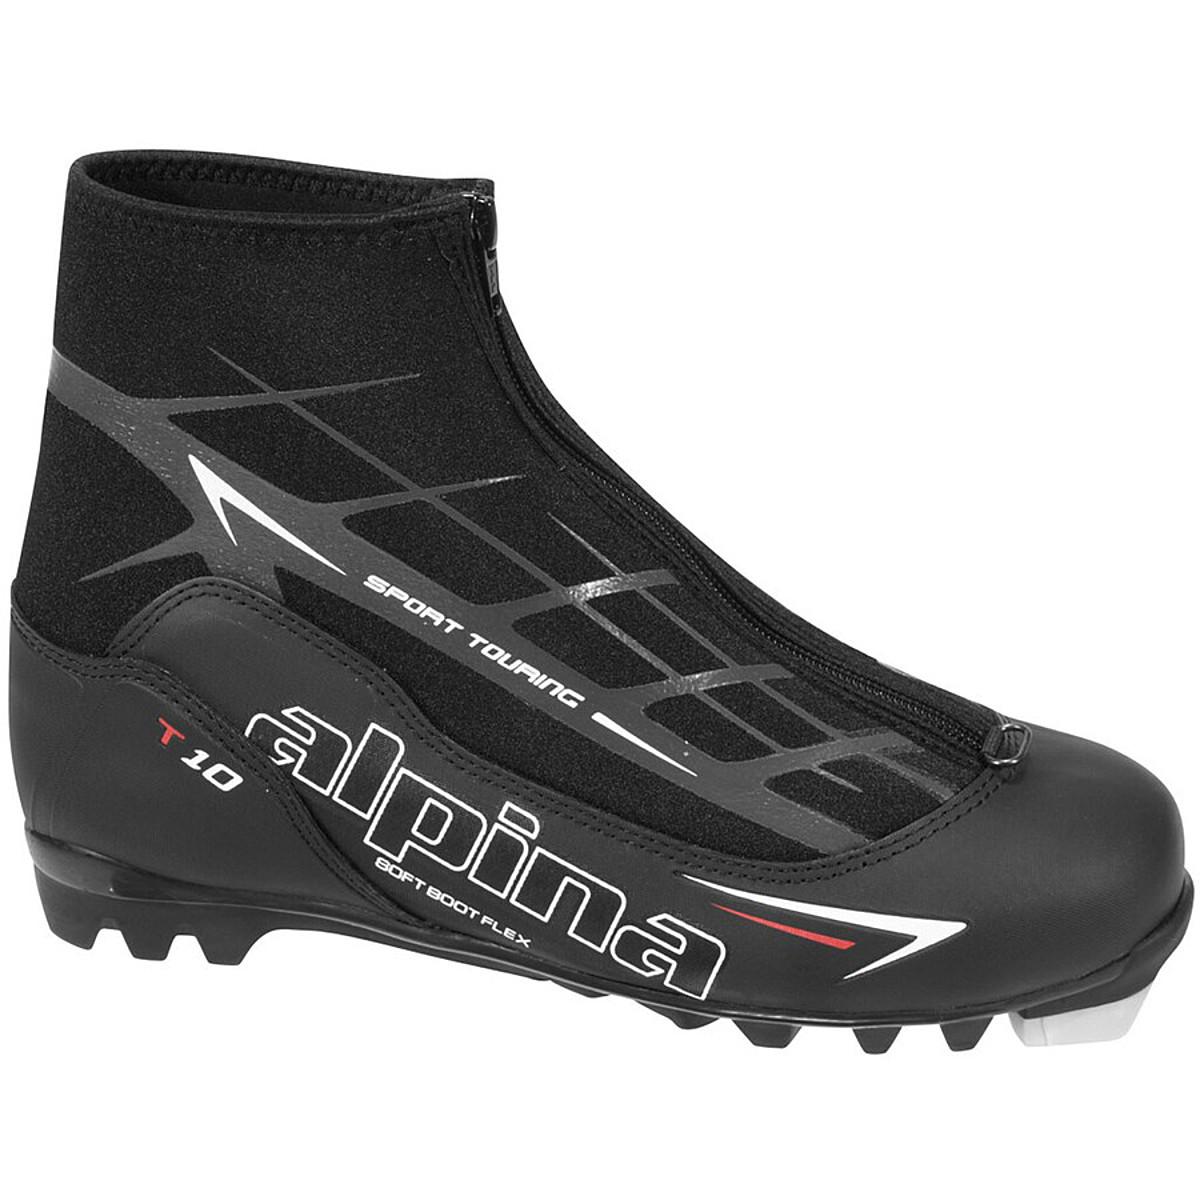 photo: Alpina Kids' T10 nordic touring boot